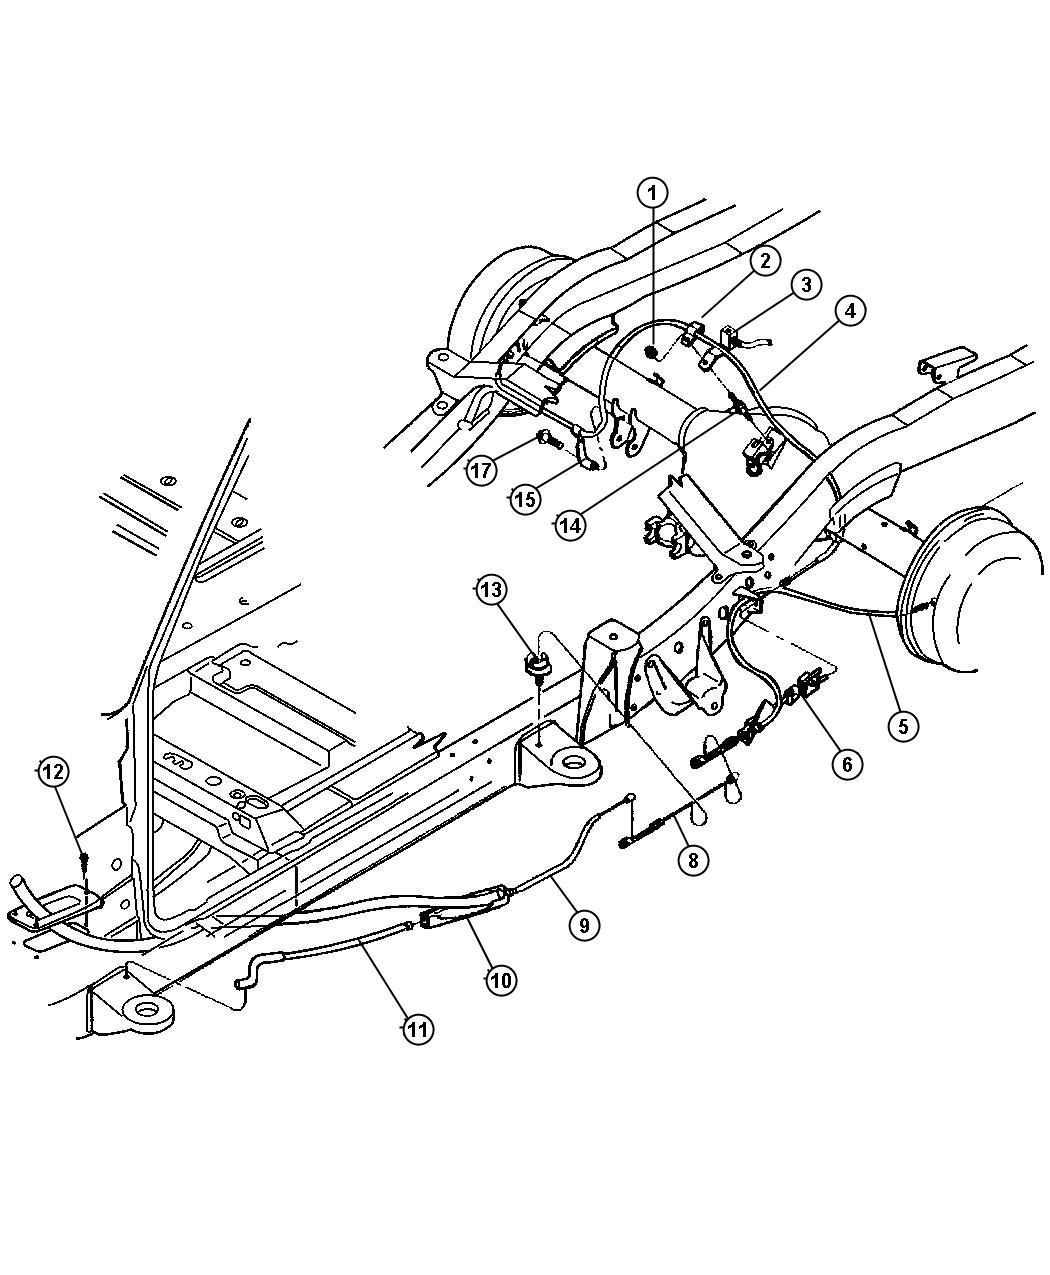 Dodge Dakota Front Disc Brake Diagram